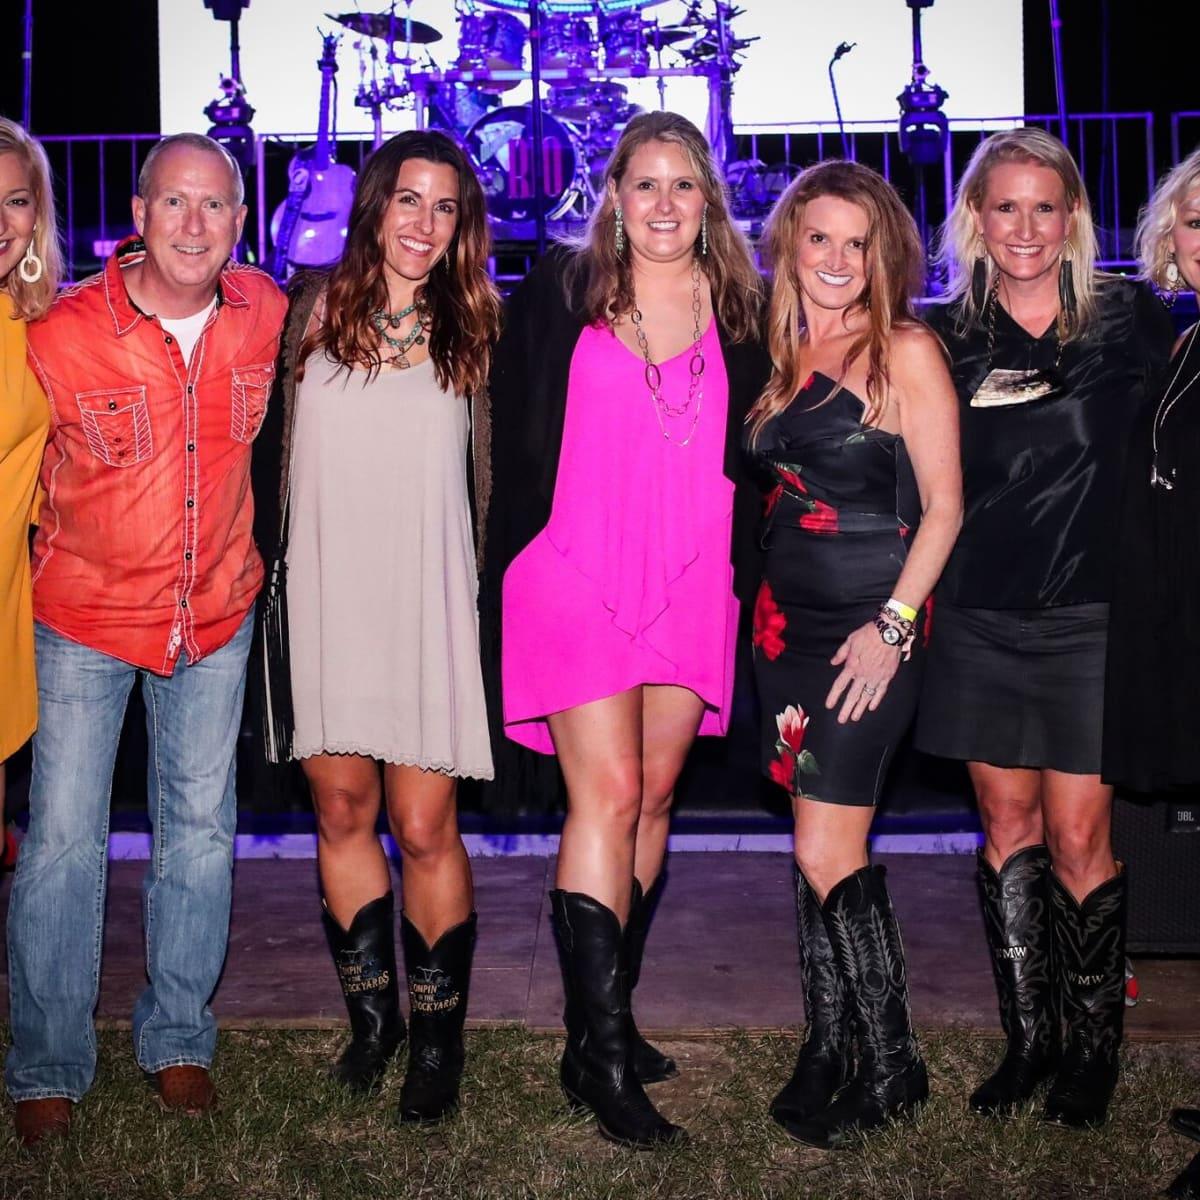 Elizabeth Humble, Jeff Deets, Carla Collins, Cortney Craft, Kim Johnson, Wendy Wright, Jennifer William, Cowtown Ball